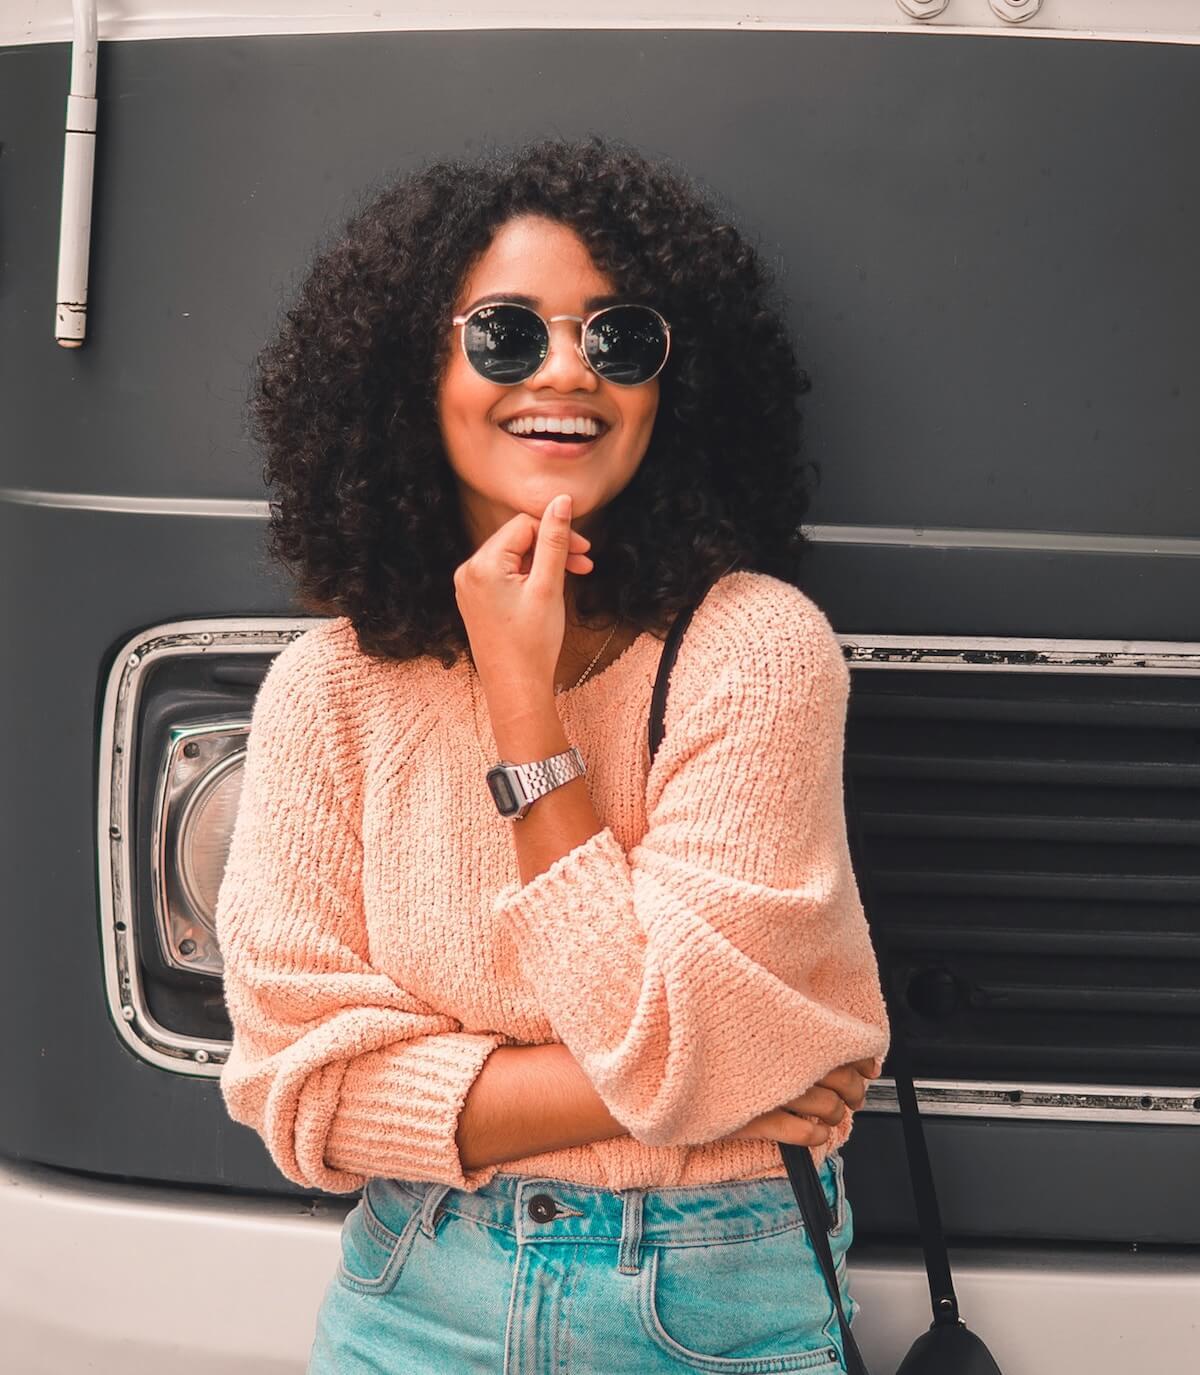 unsplash-philipe-cavalcante-woman-smiling-sunglasses-posing-bus